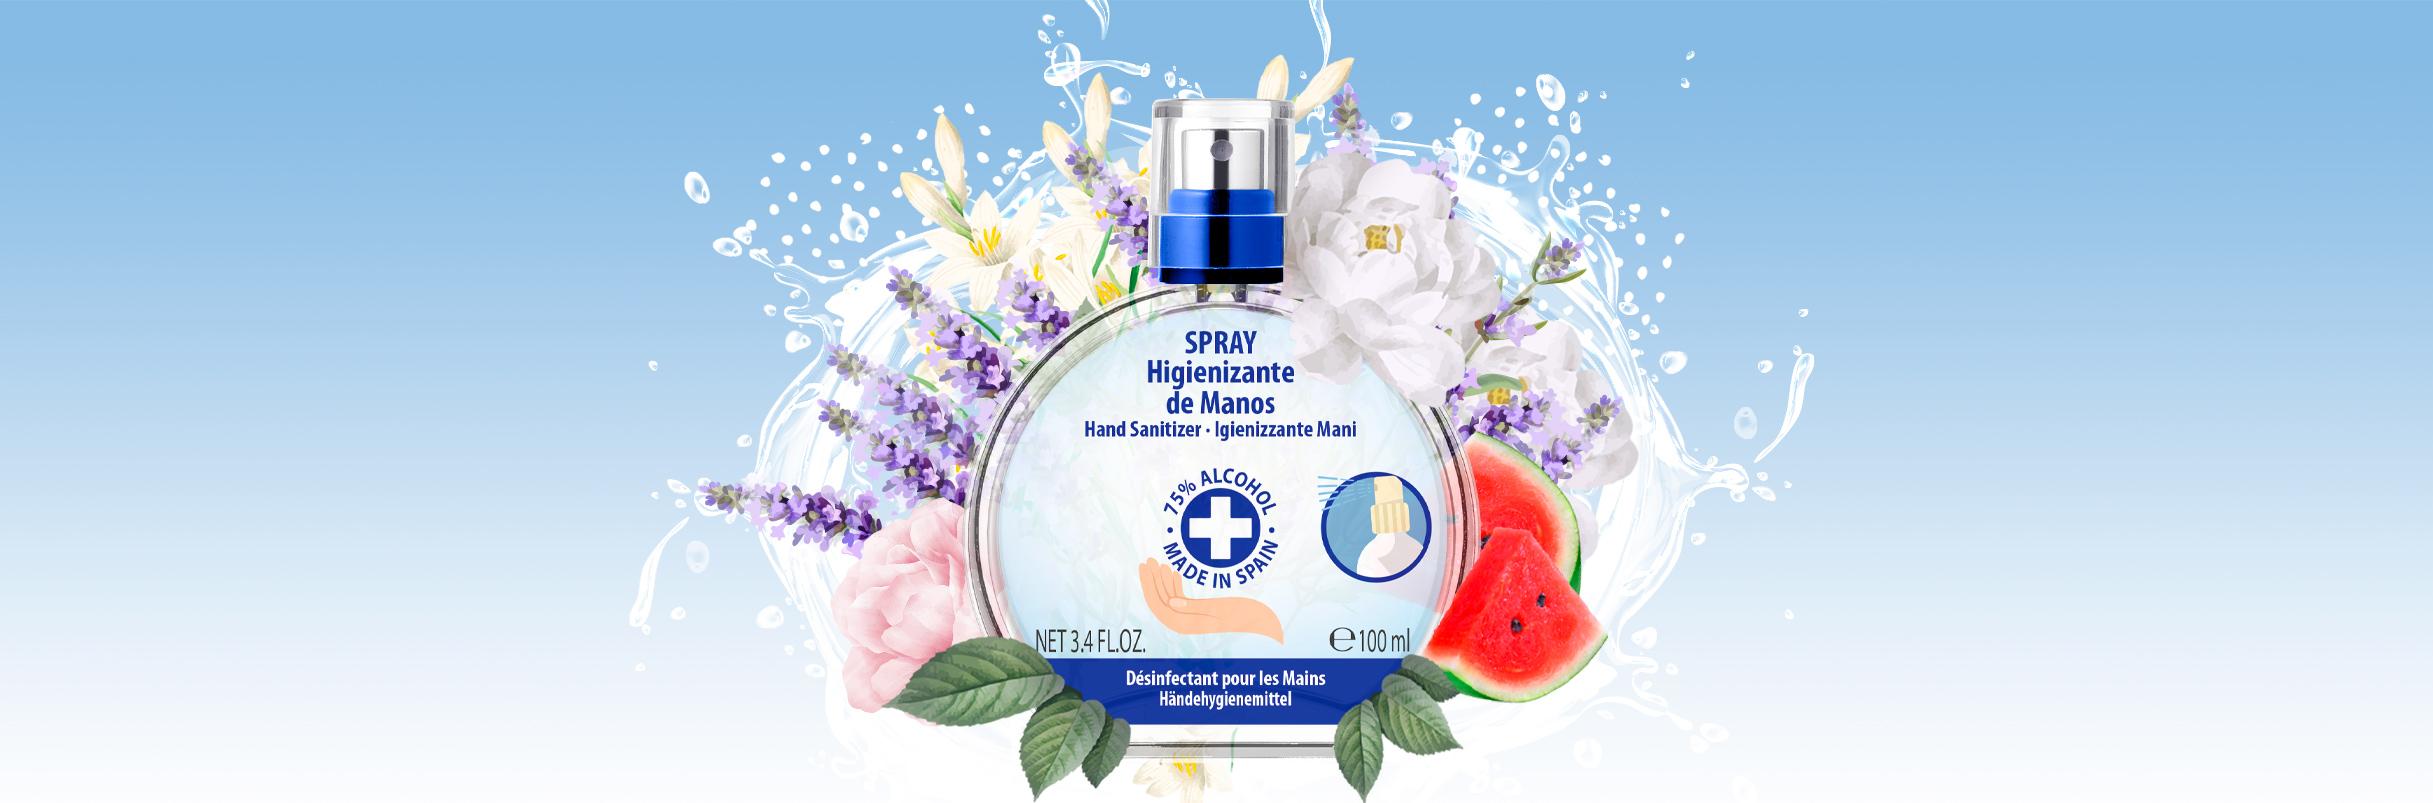 Hydroalcoholic gels